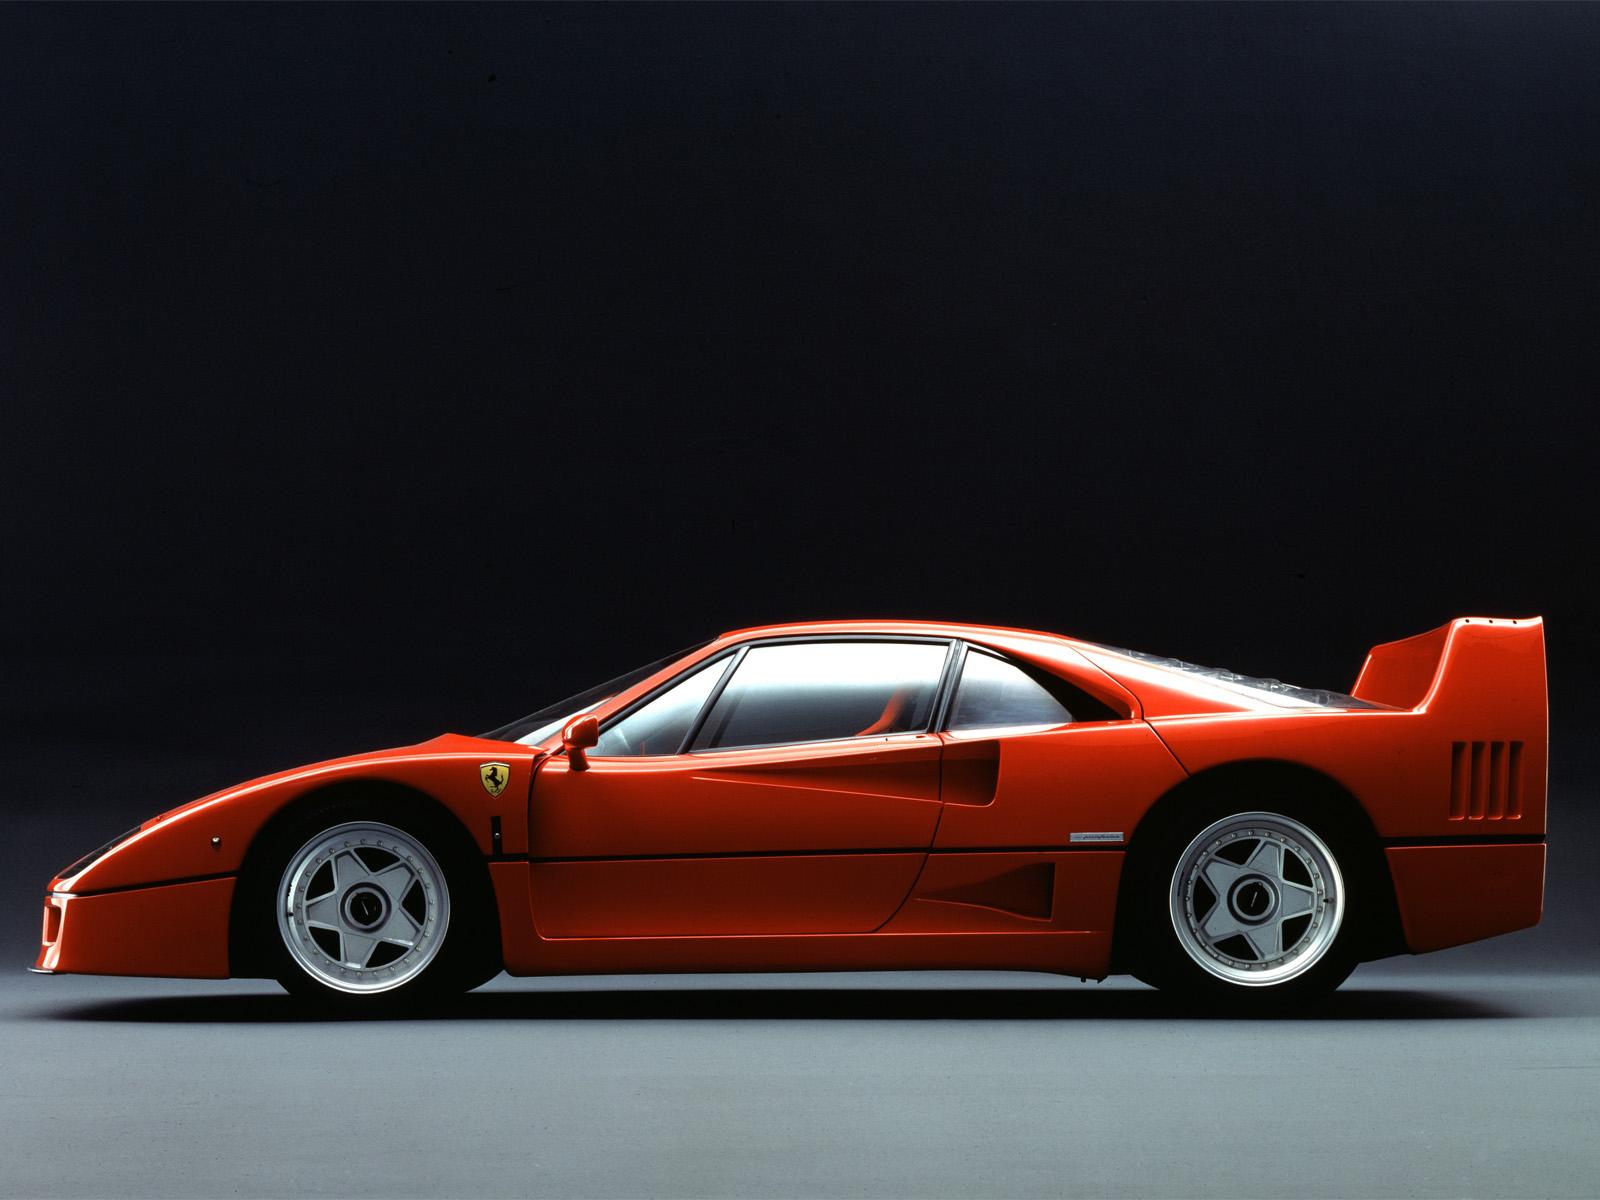 1987 Ferrari F40 Wallpapers Hd Drivespark